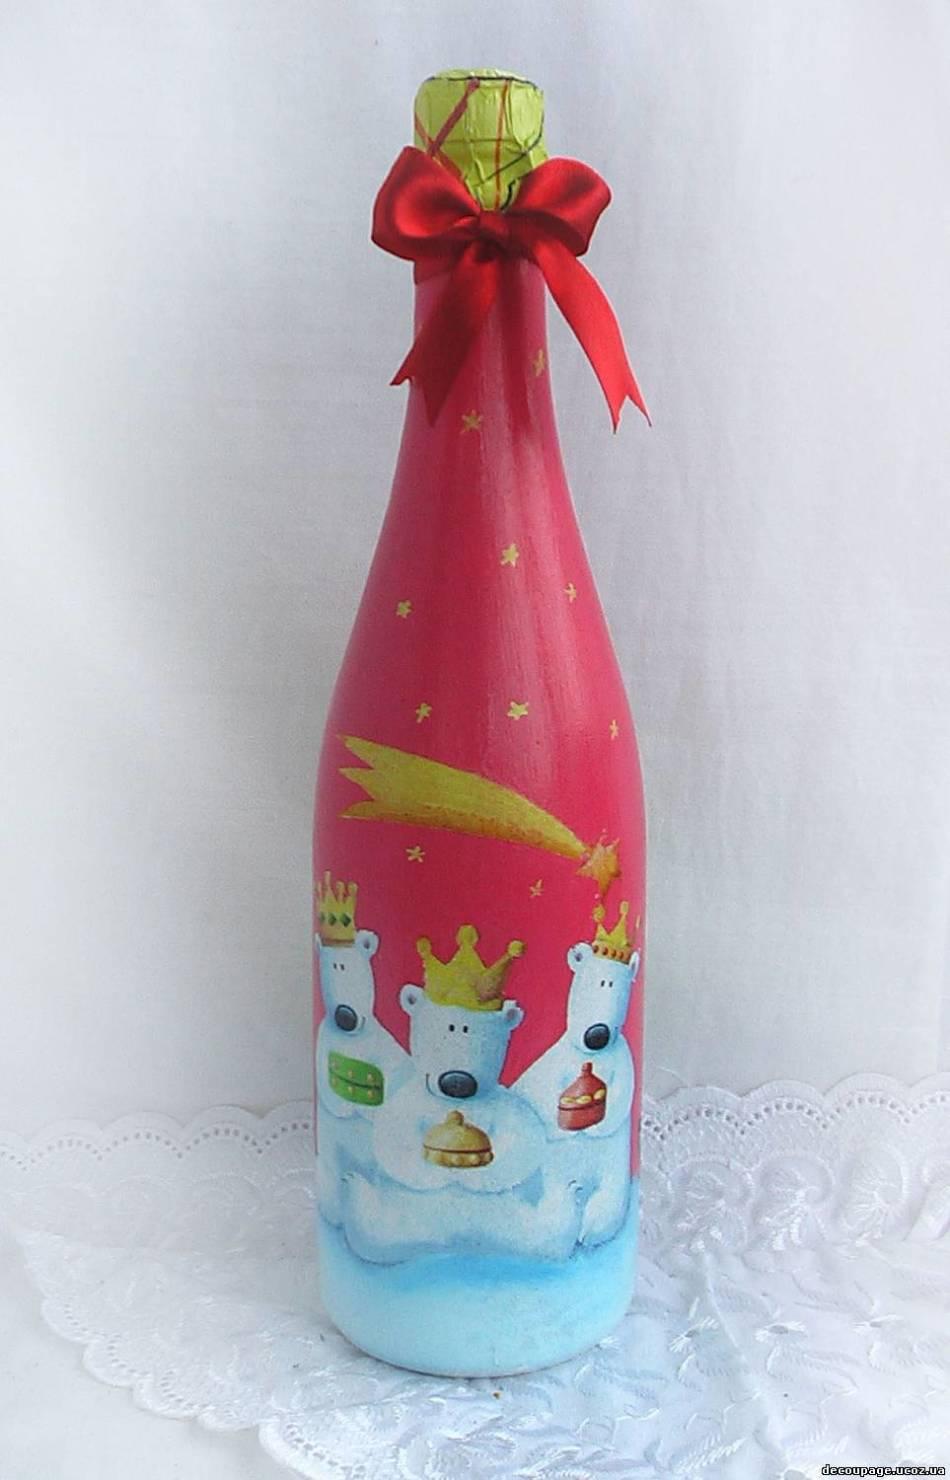 2e326bb6f1f7af174f11c89e257a2316 Декор бутылки на праздник в день рождение малыша